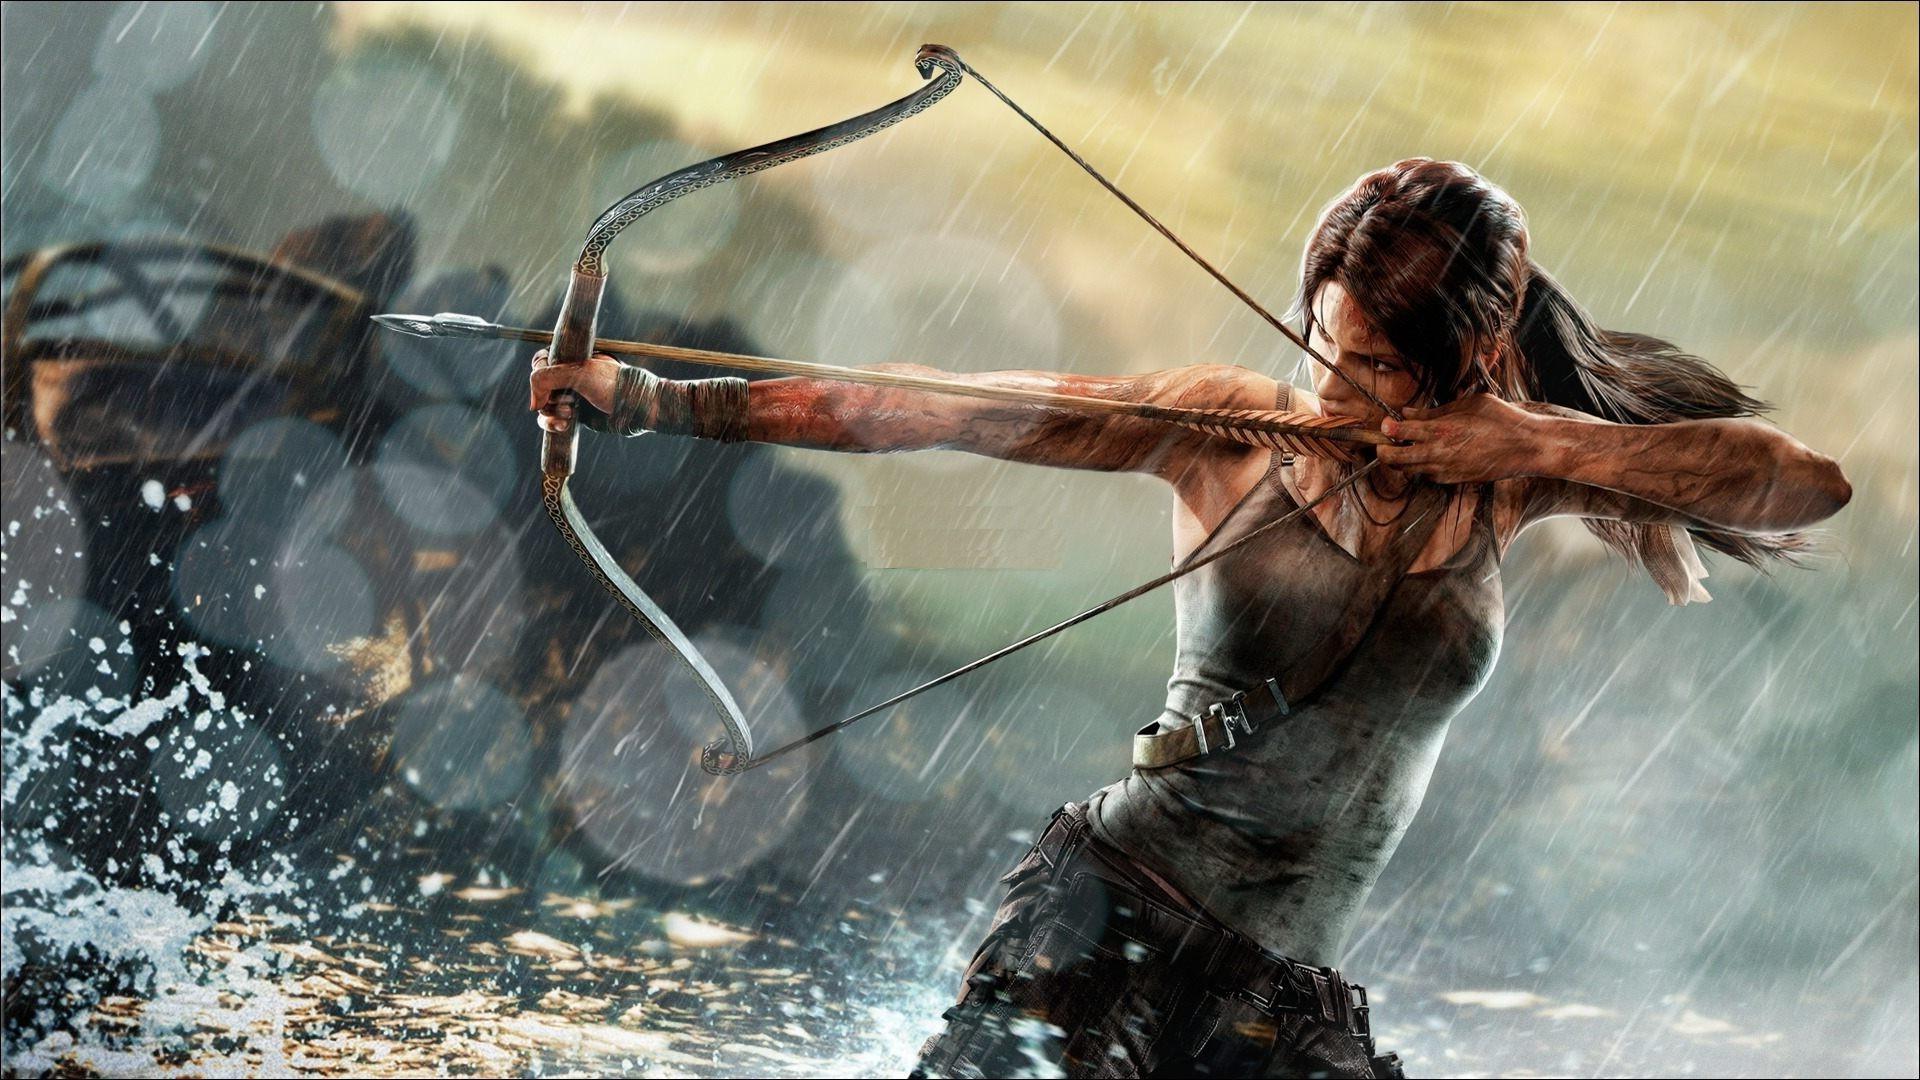 1920x1080 Px Archers Bows Lara Croft Rise Of The Tomb Raider Video Games